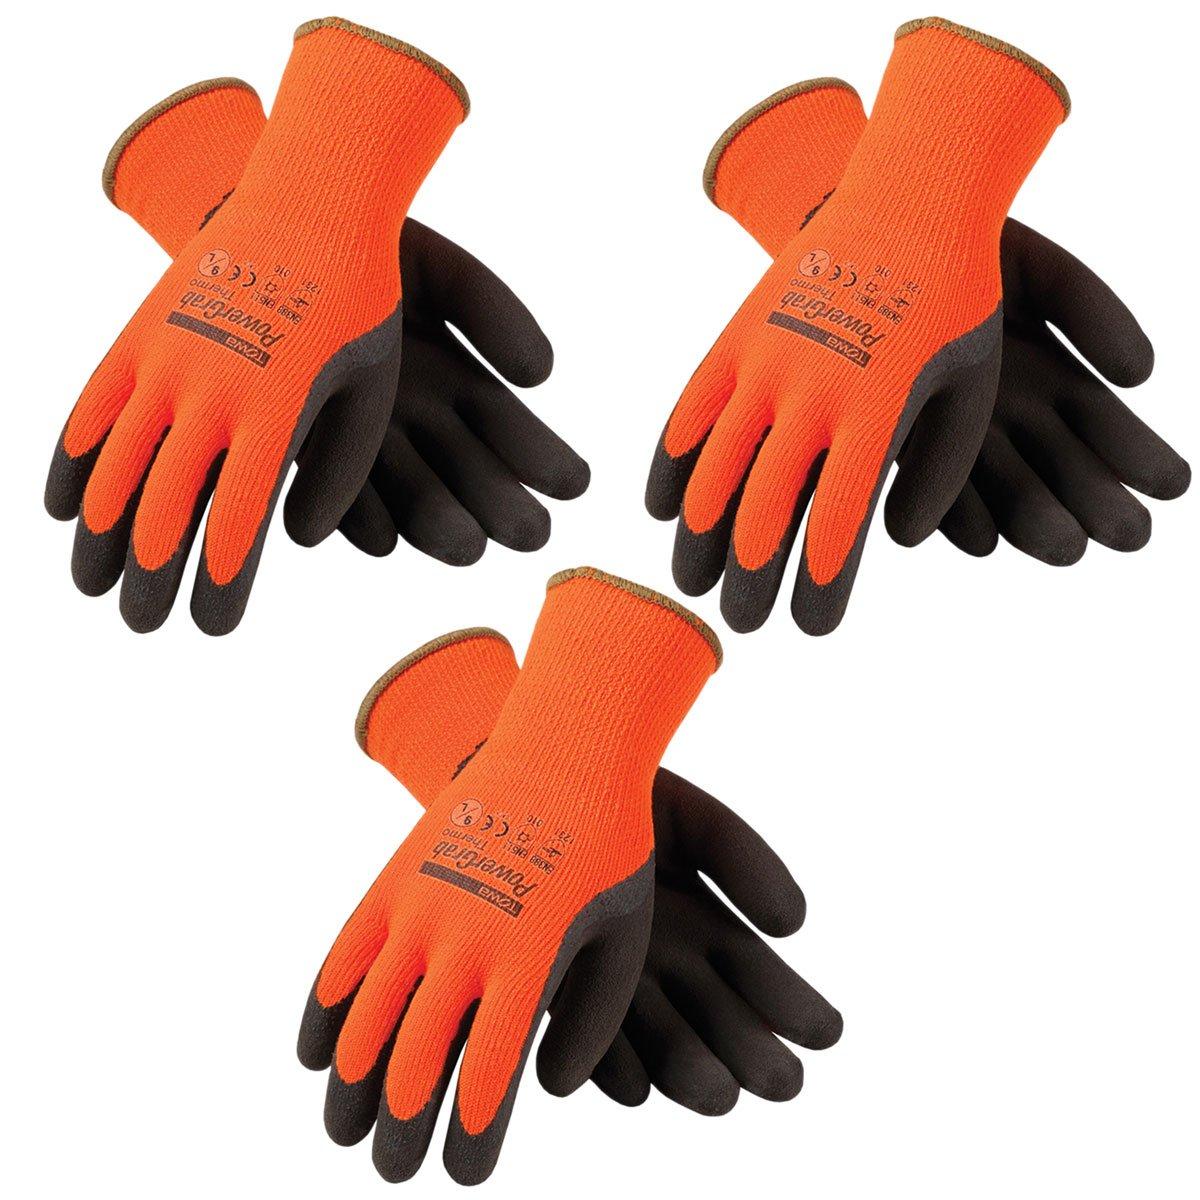 3 Pack Powergrab 41-1400 Thermal Hi-Vis Orange/Black Cold Condition Work Gloves (XX- Large) (3)